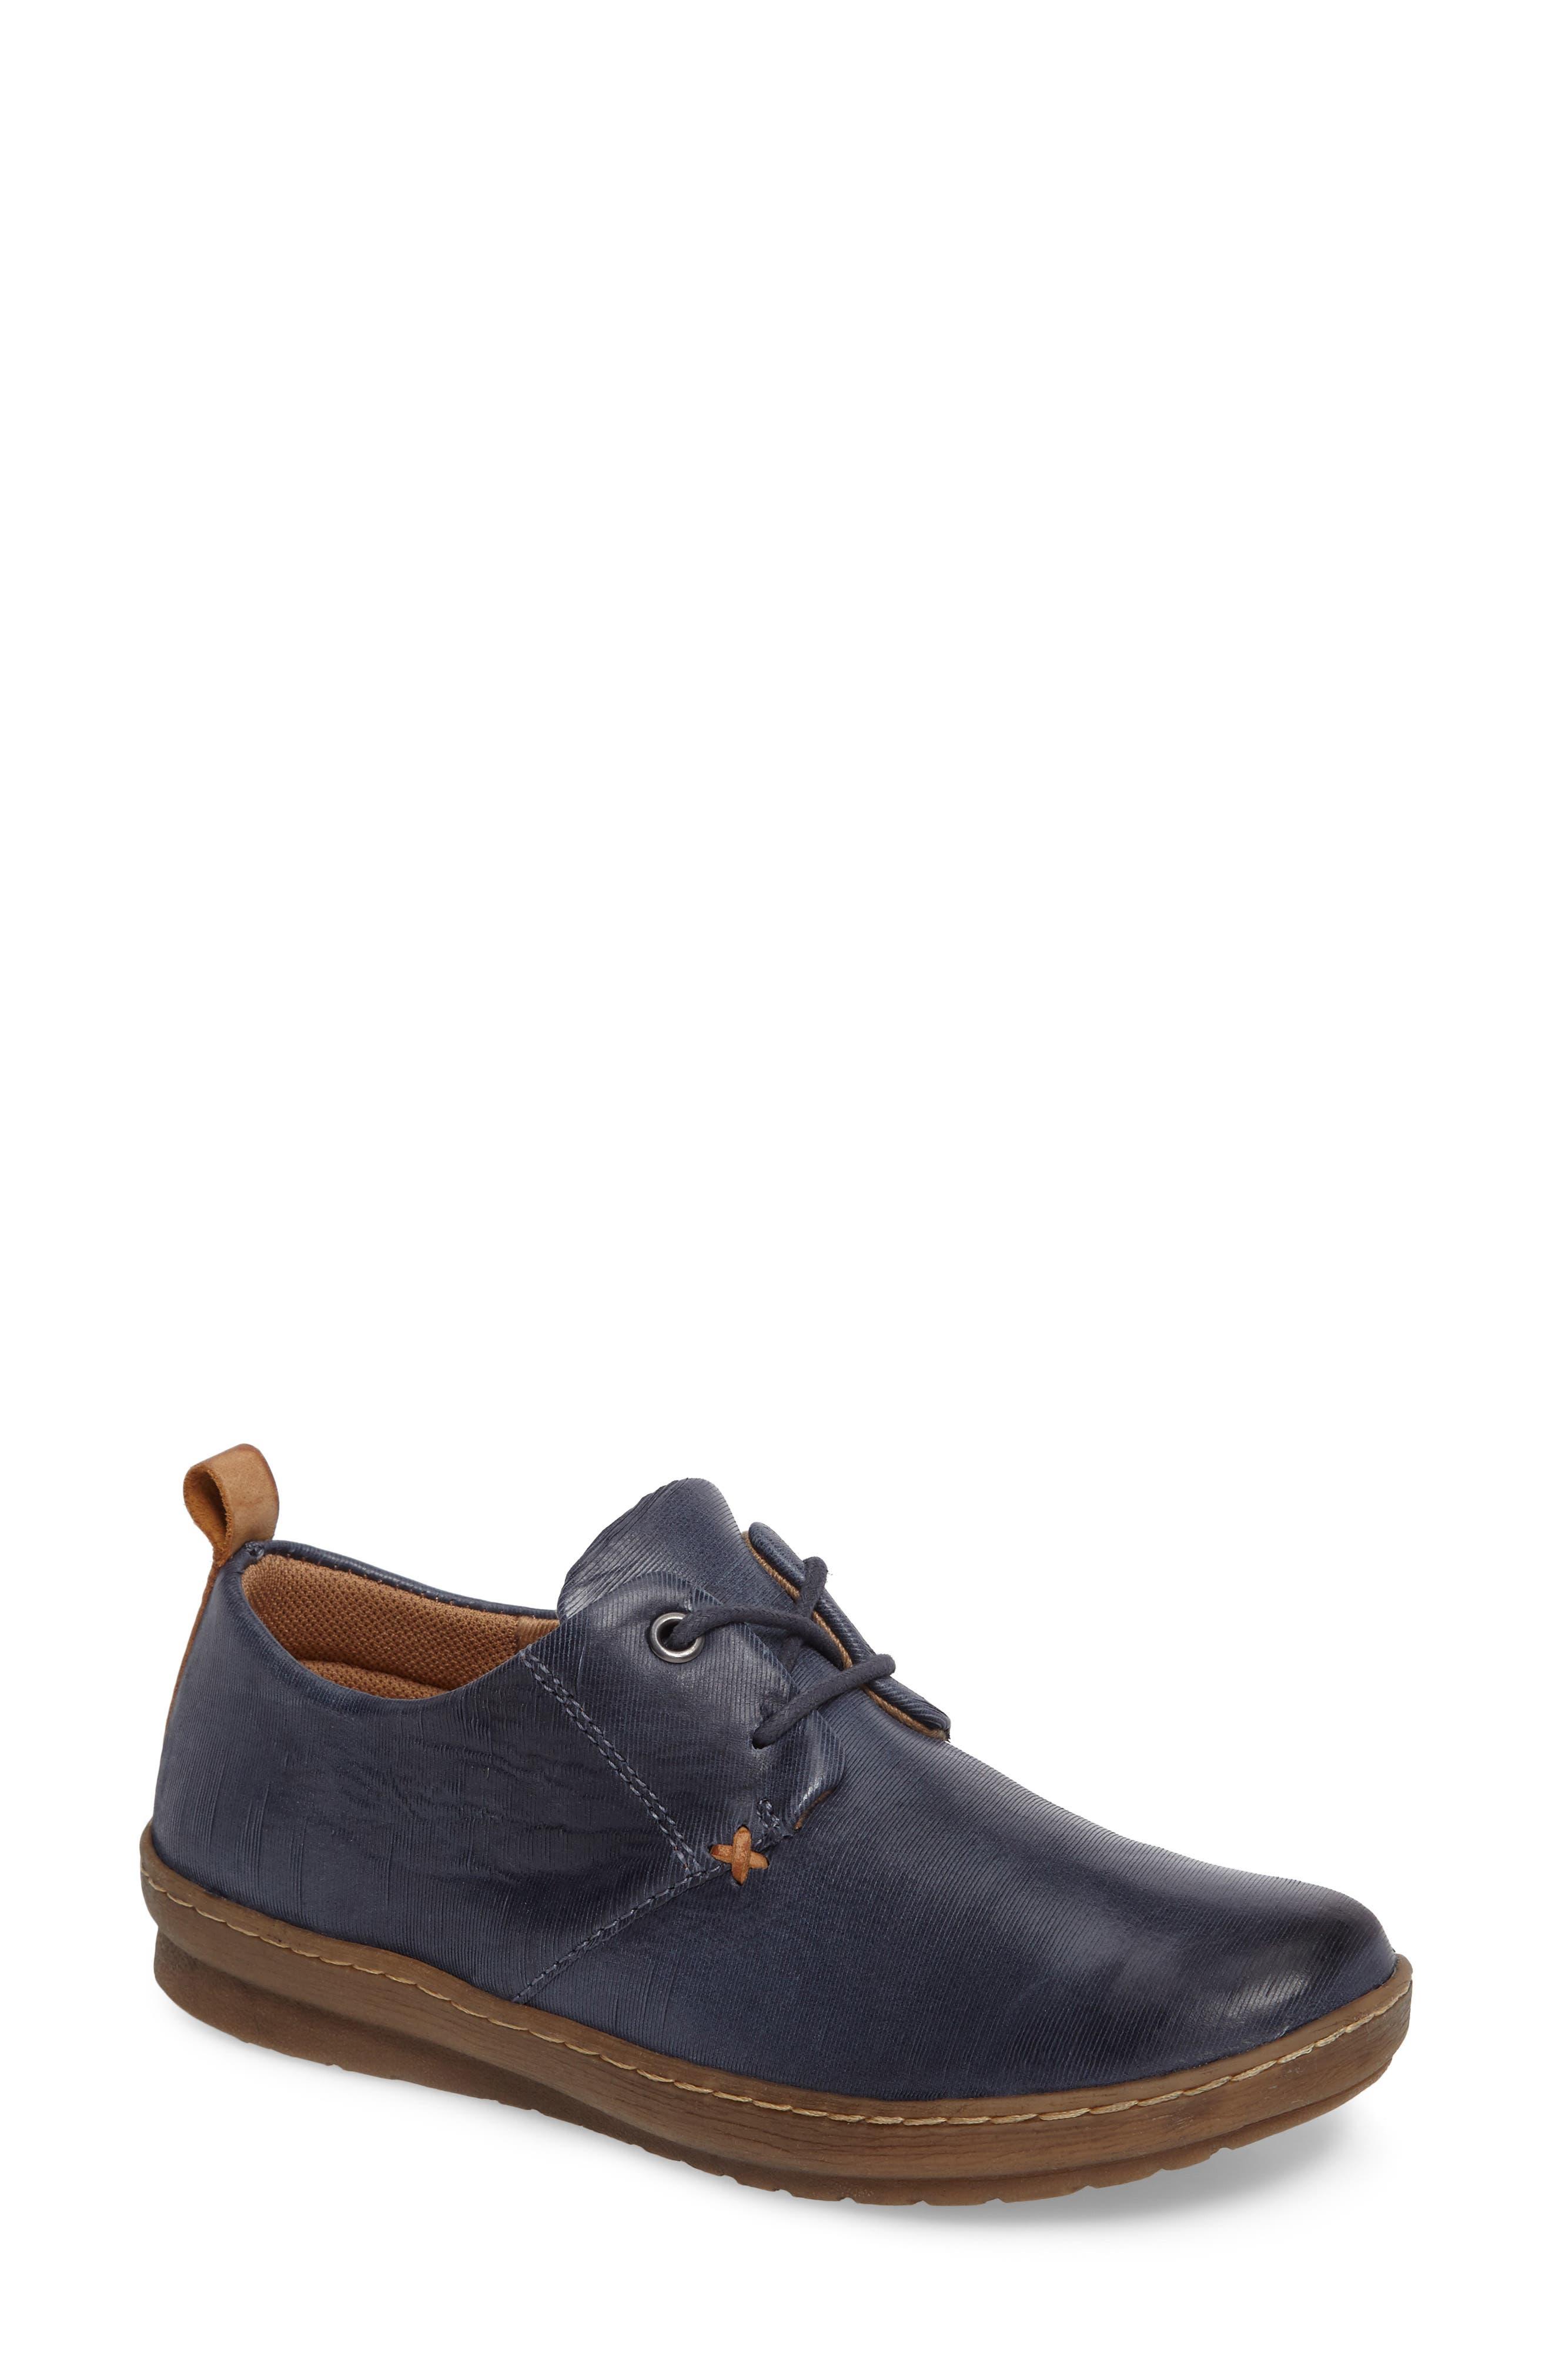 Cassandra Siped Sneaker,                         Main,                         color, Denim Blue Leather